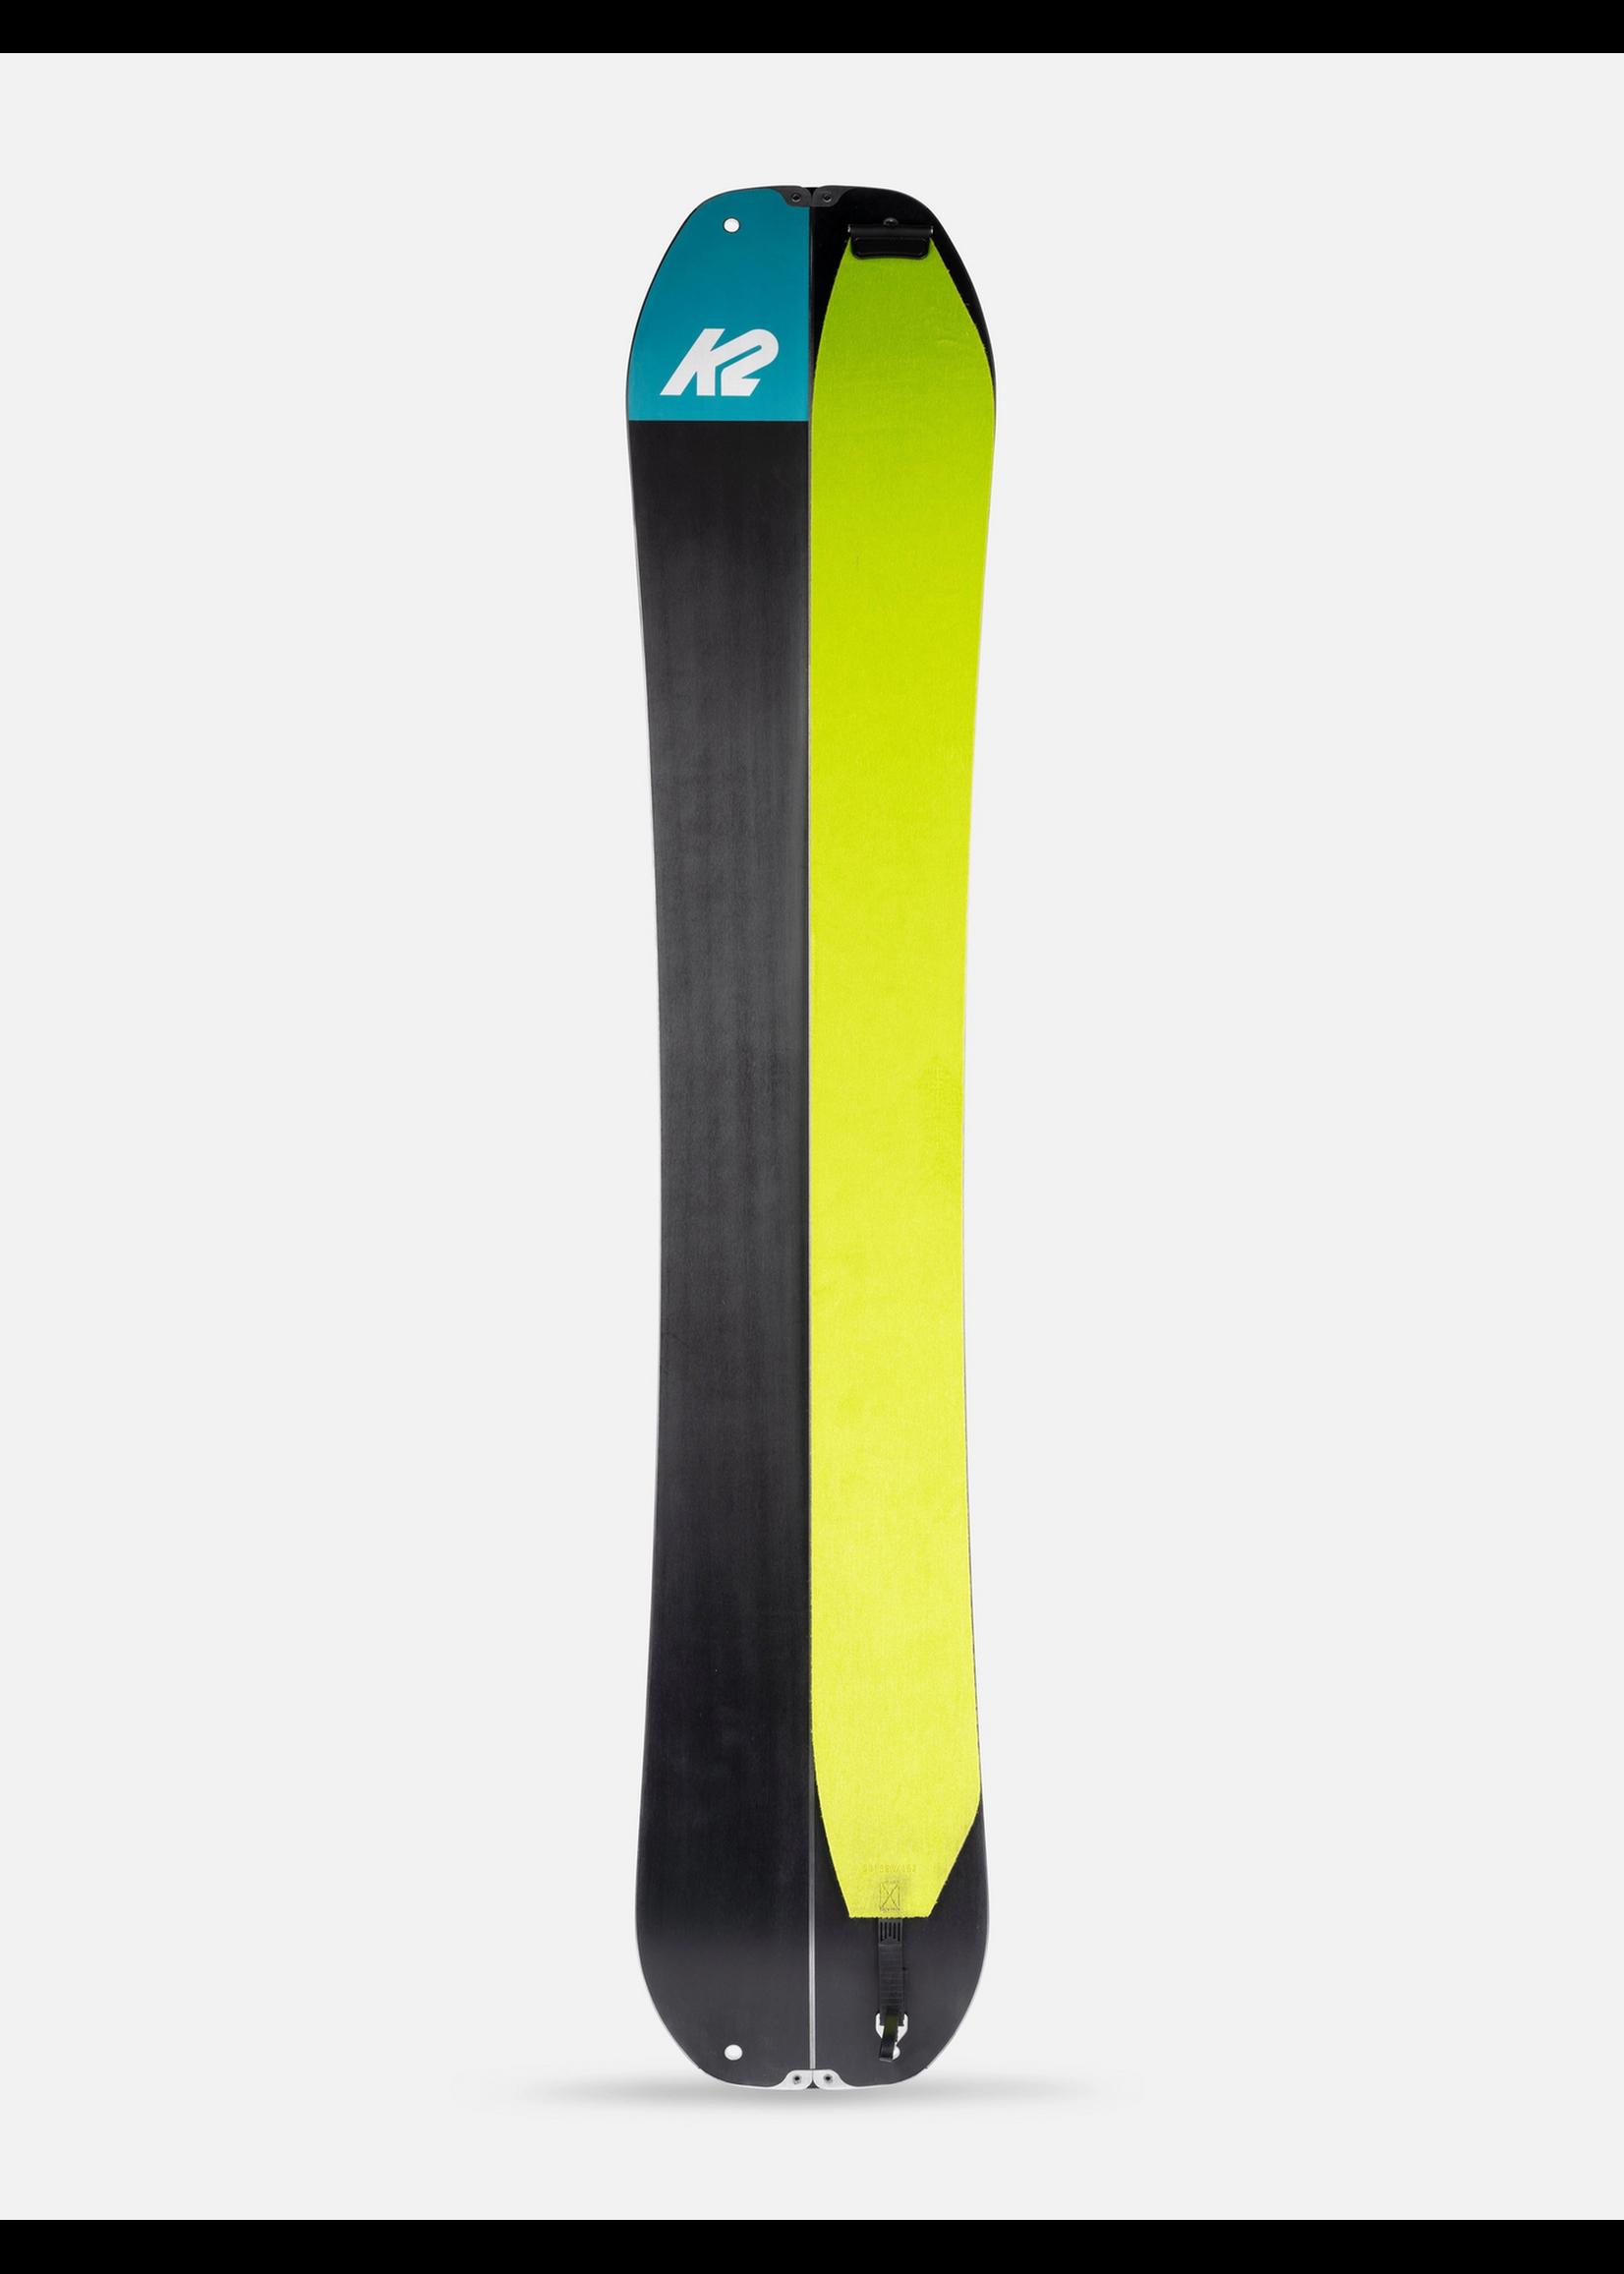 K2 FREELOADER SPLIT PACKAGE